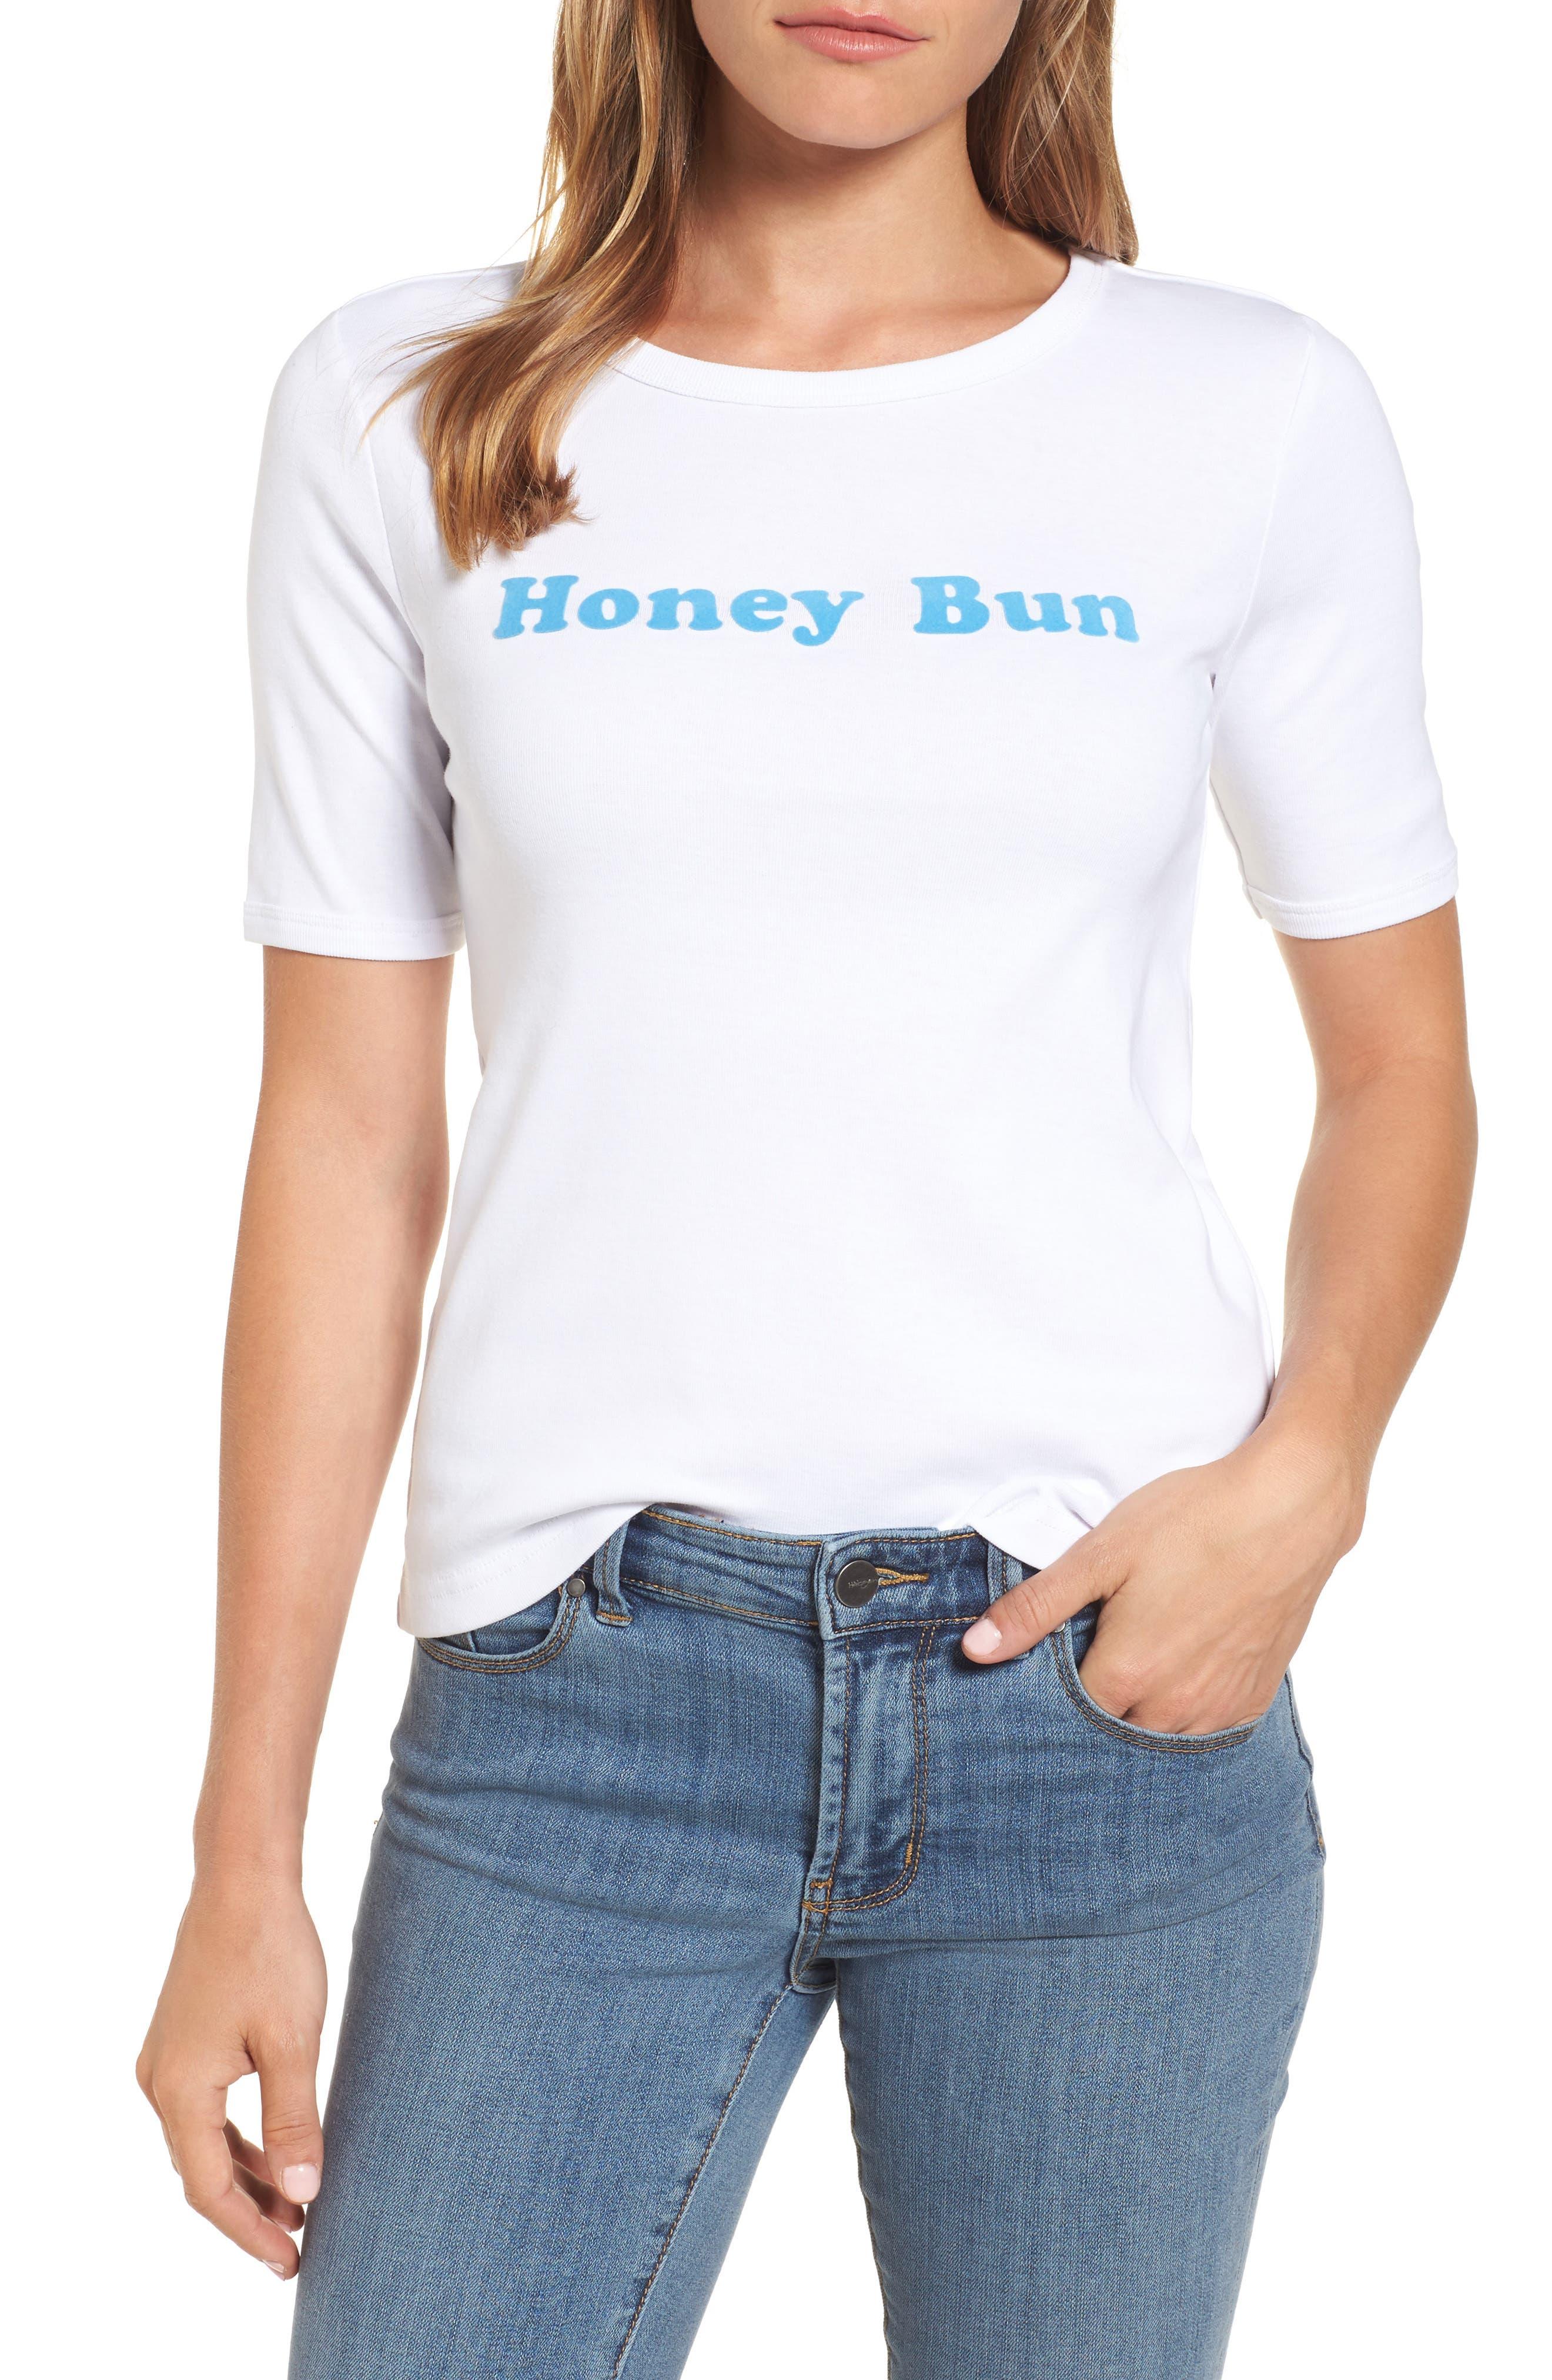 Honey Bun Tee,                             Main thumbnail 1, color,                             130